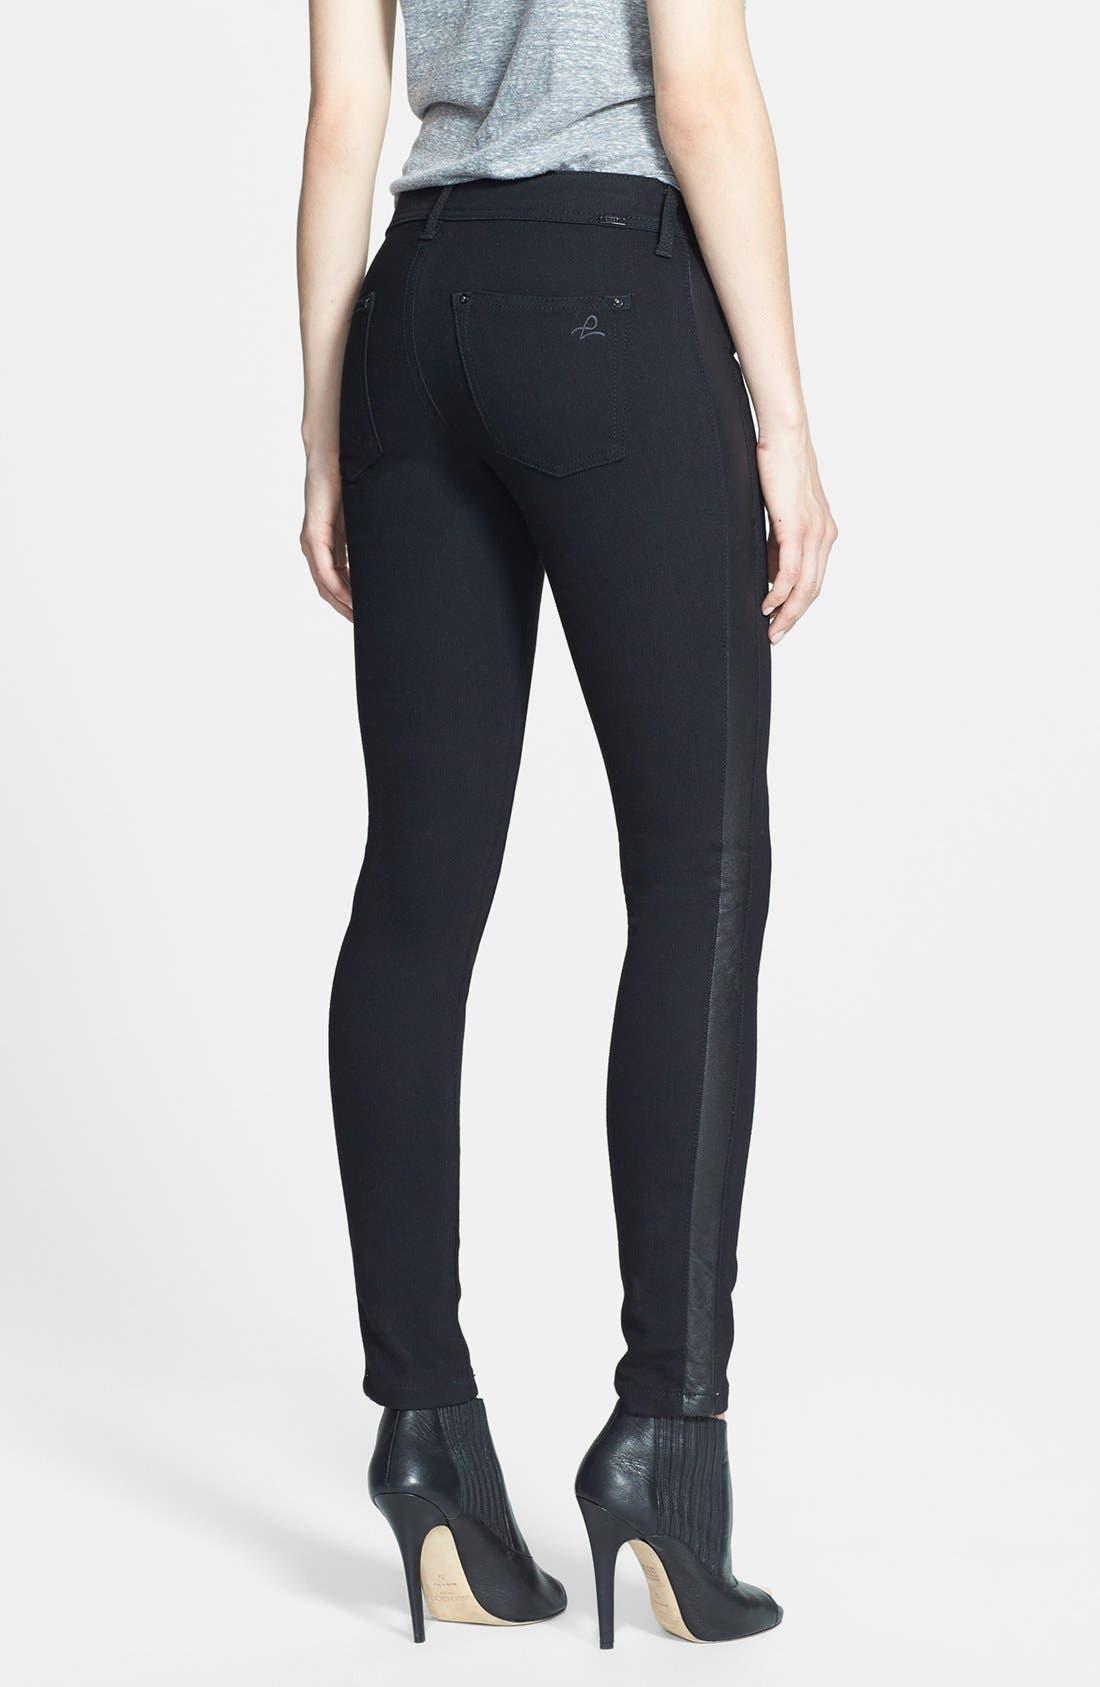 Alternate Image 2  - DL1961 'Emma' Leather Tuxedo Stripe Skinny Jeans (Ravenna)